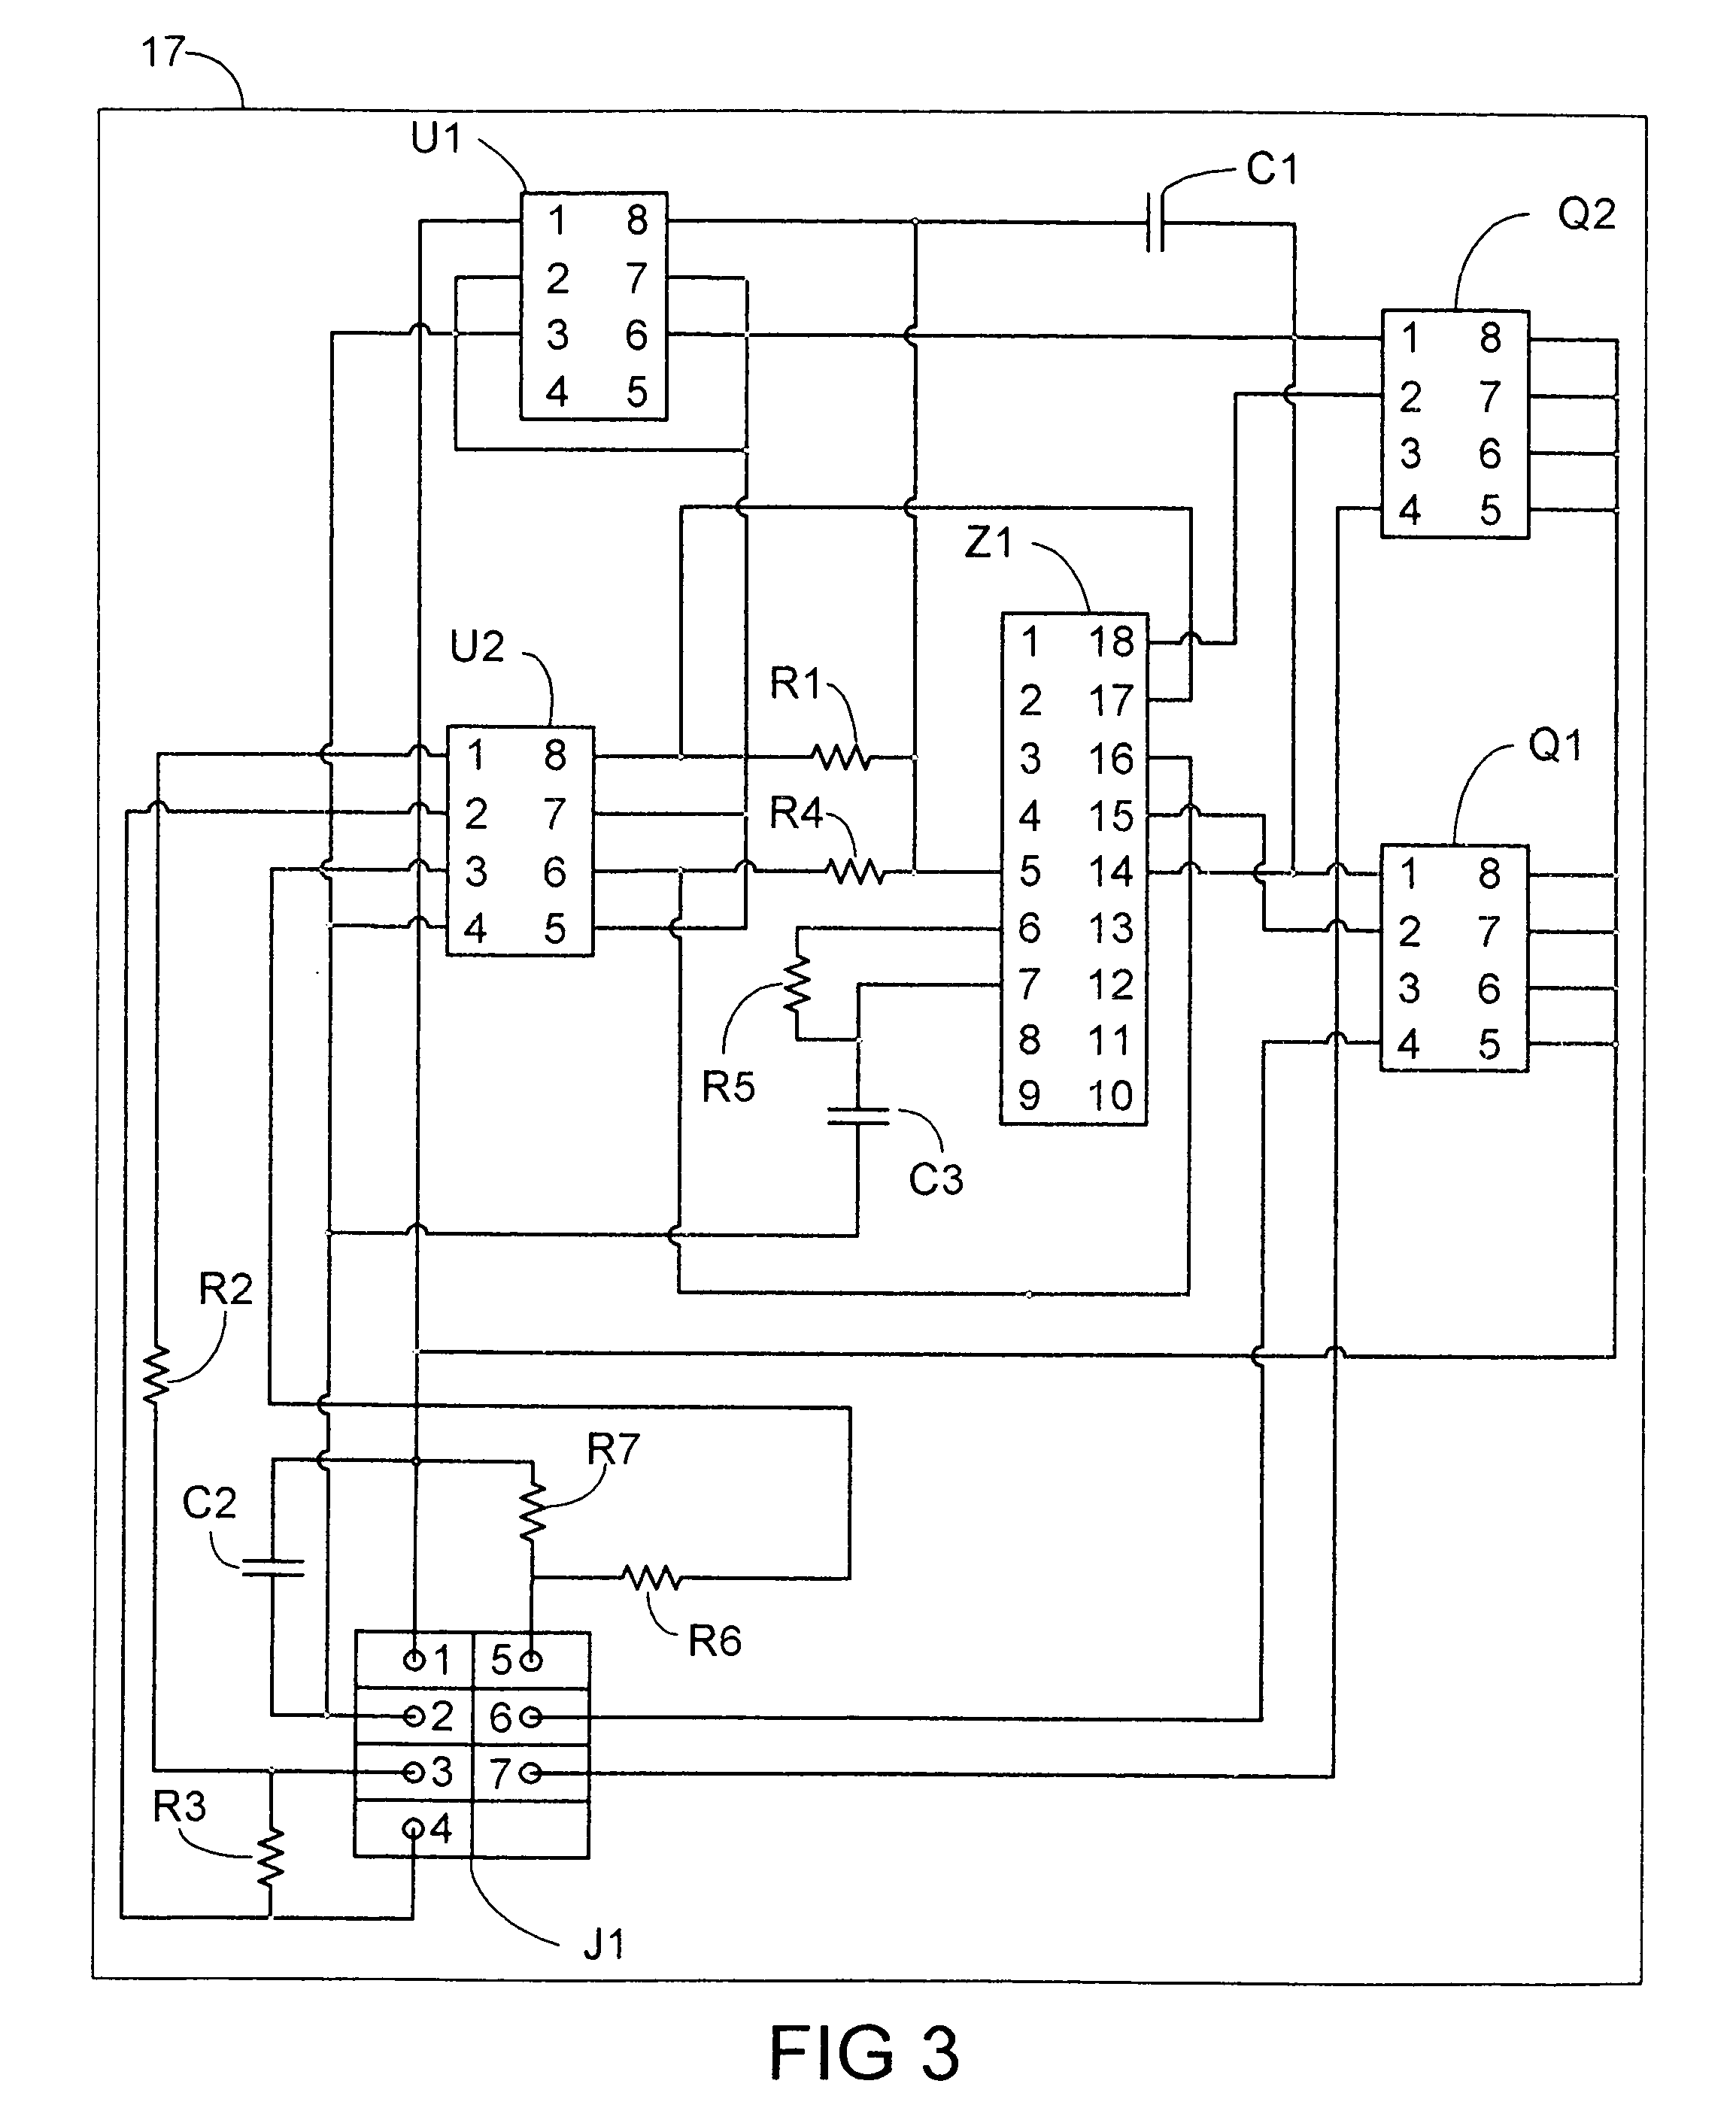 DIAGRAM] Cushman Minute Miser Wiring Diagram FULL Version HD Quality Wiring  Diagram - A1AIRWAYDIAGRAM.BOUNCEMUSIC.ITbouncemusic.it